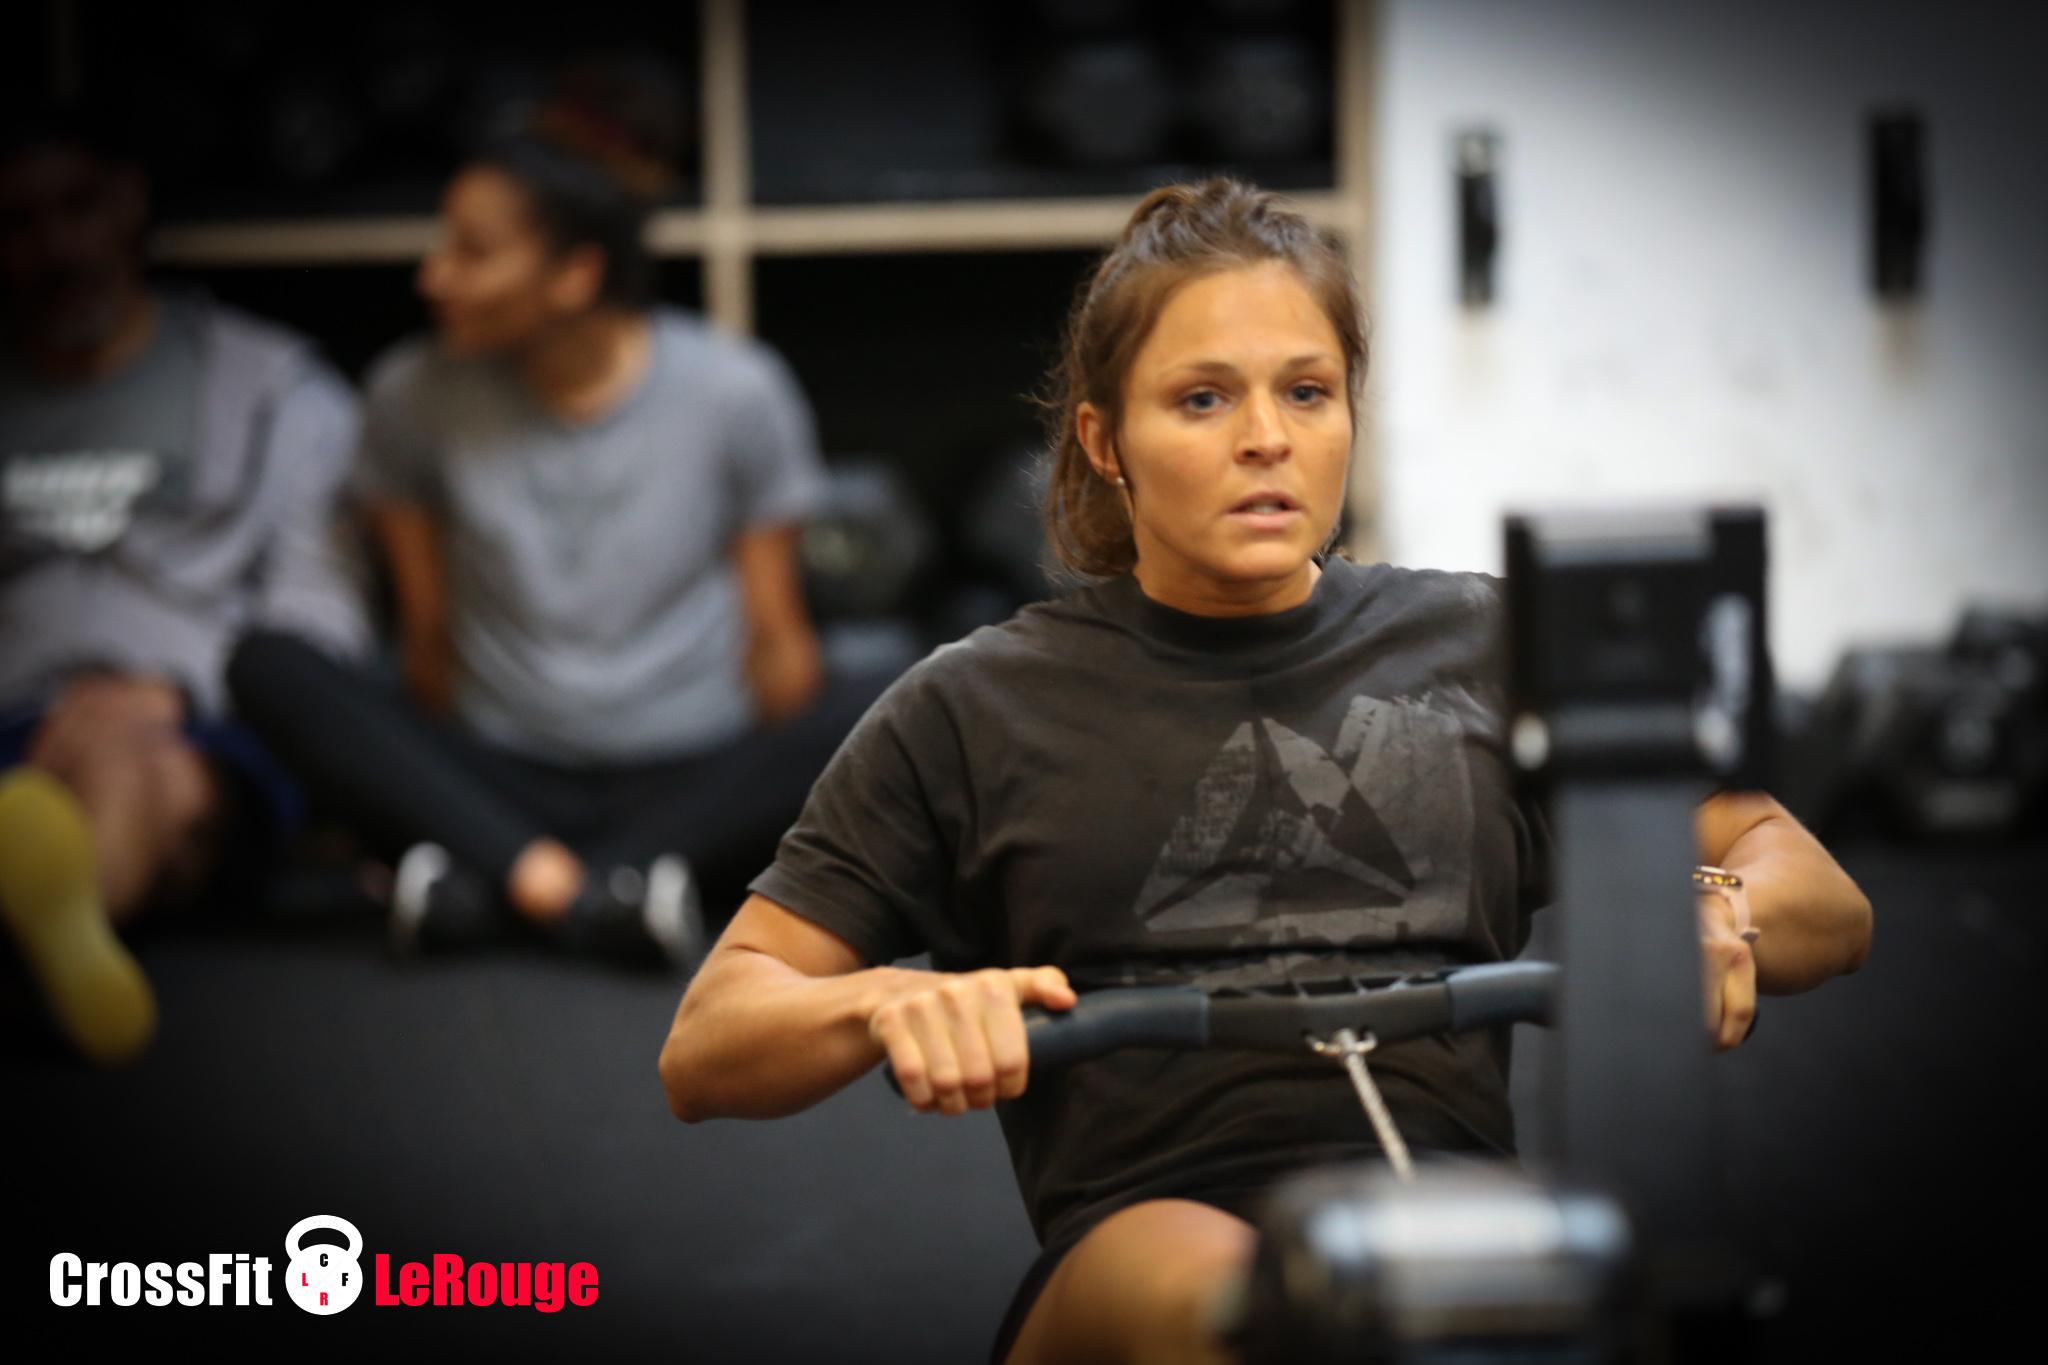 CrossFit WOD single-leg squat rowing Concept2